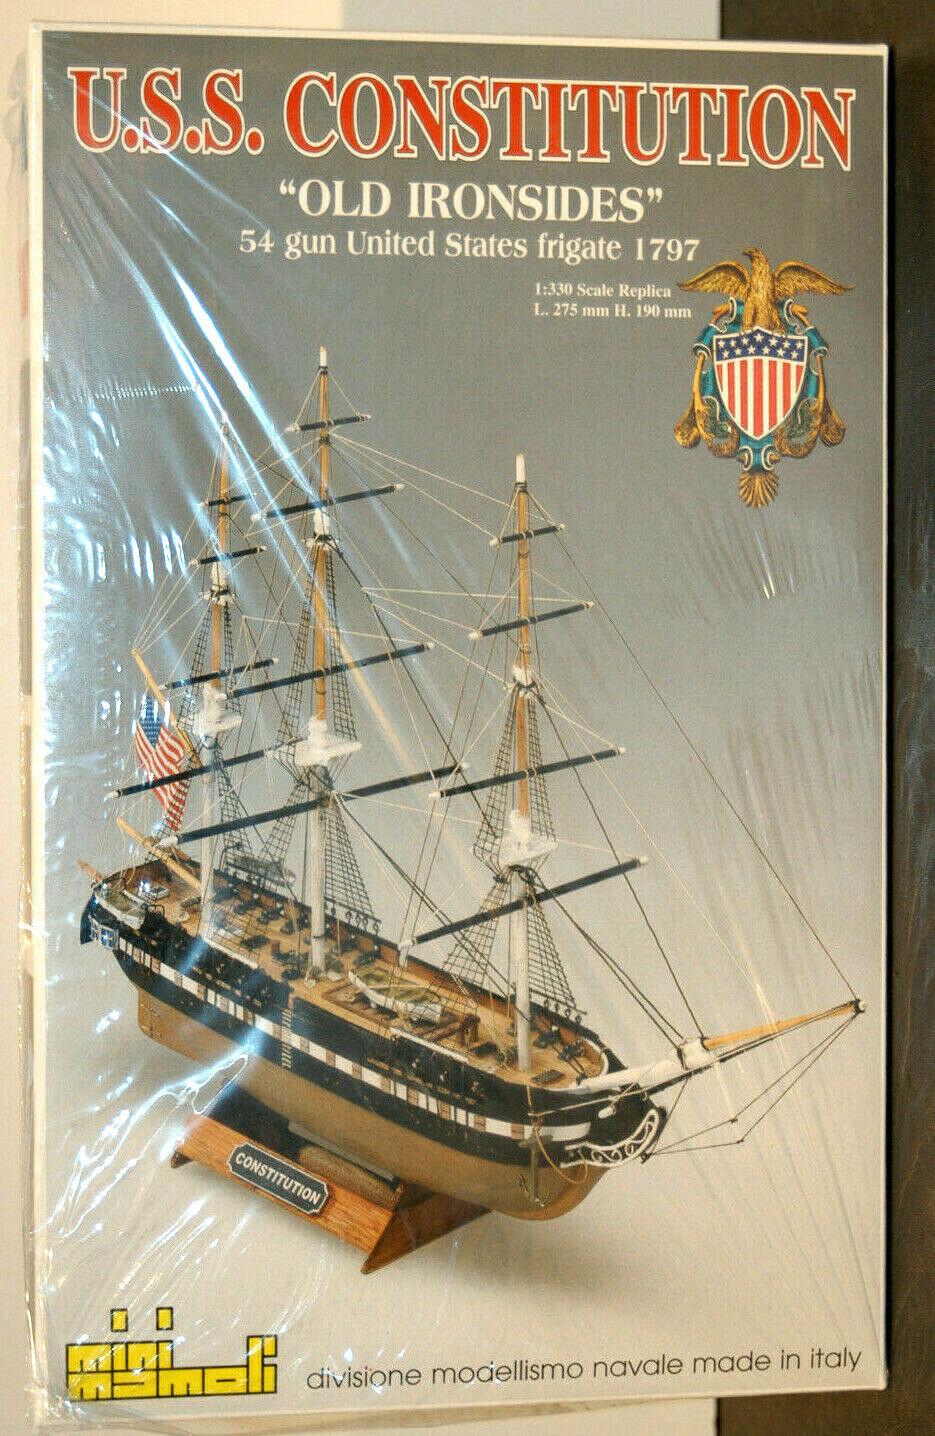 NOS Vintage Mini Mamoli U.S.S. Constitution  Old Old Old Ironsides  Ship Model MM 64 e84